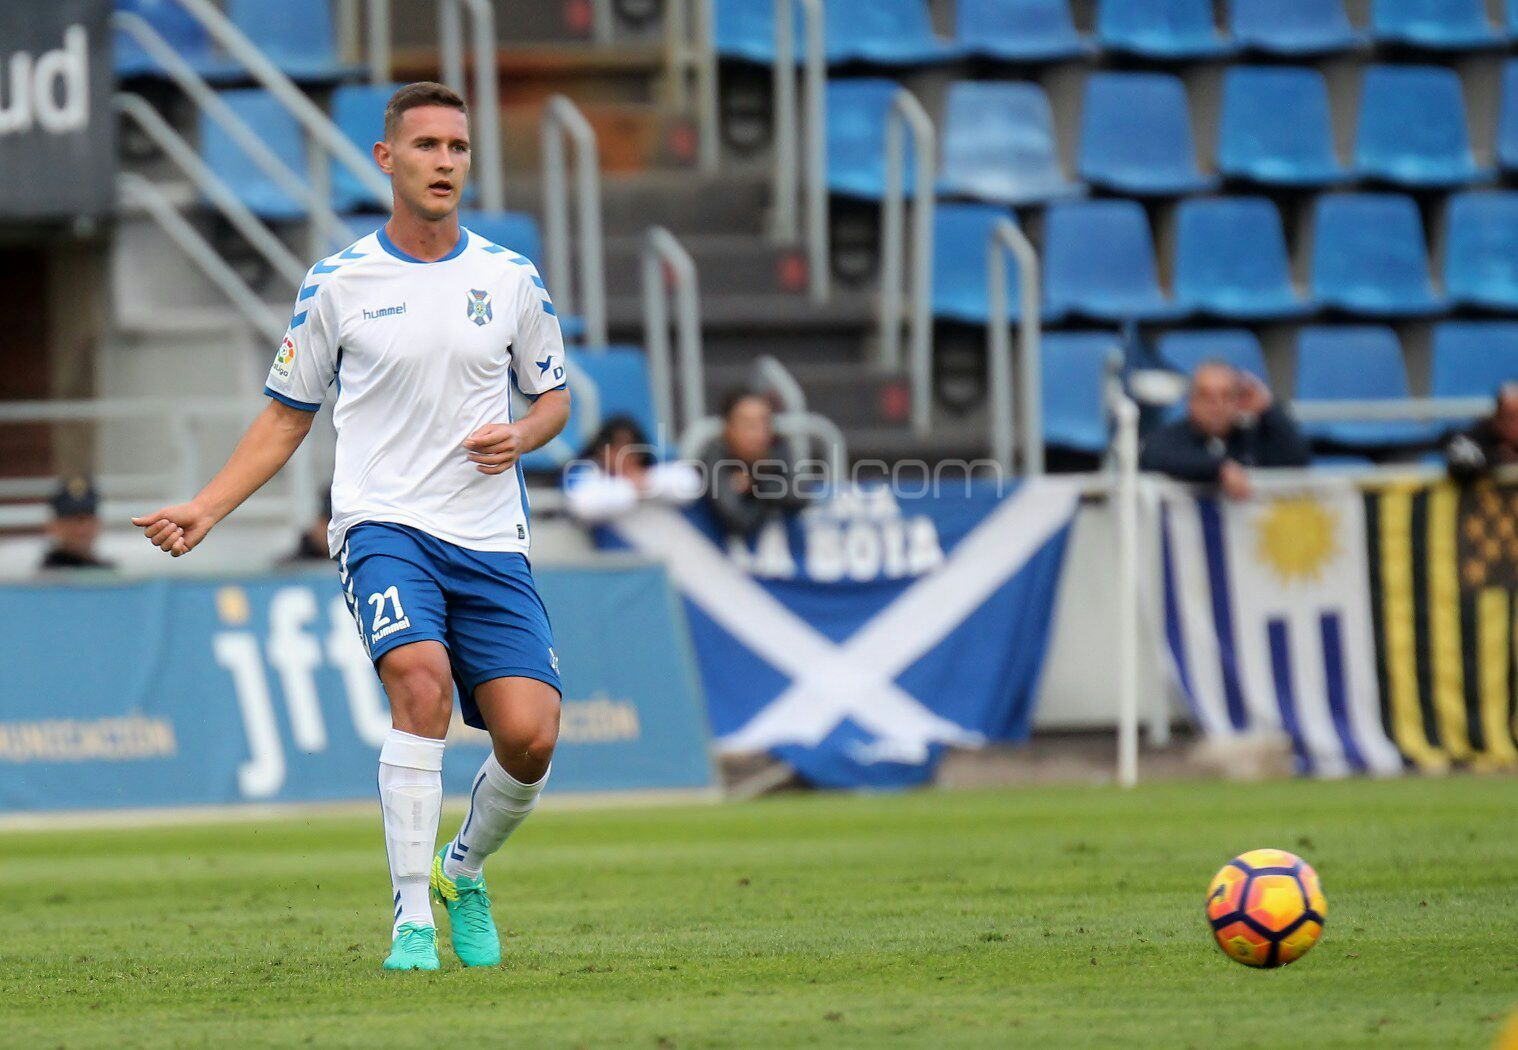 Jorge Sáenz CD Tenerife